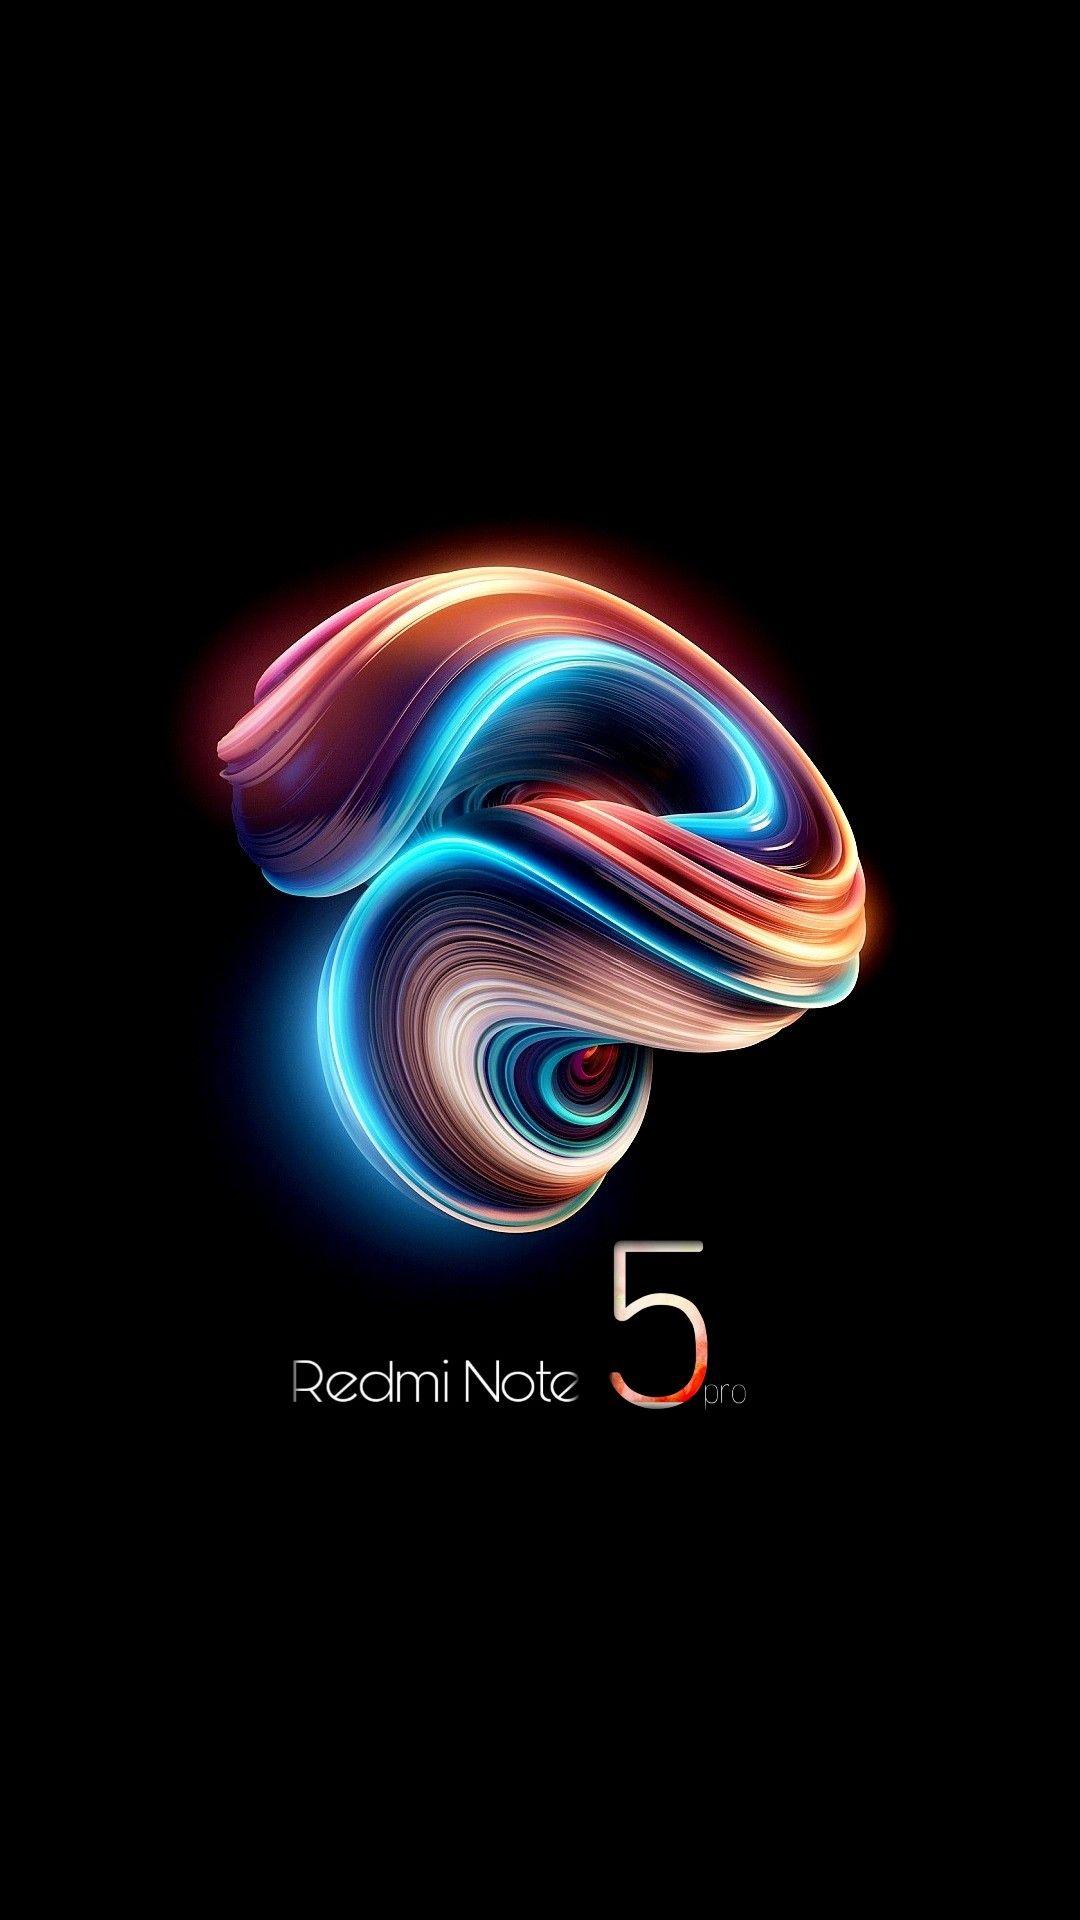 510 Koleksi Wallpaper Hp Xiaomi Redmi 5a Terbaru